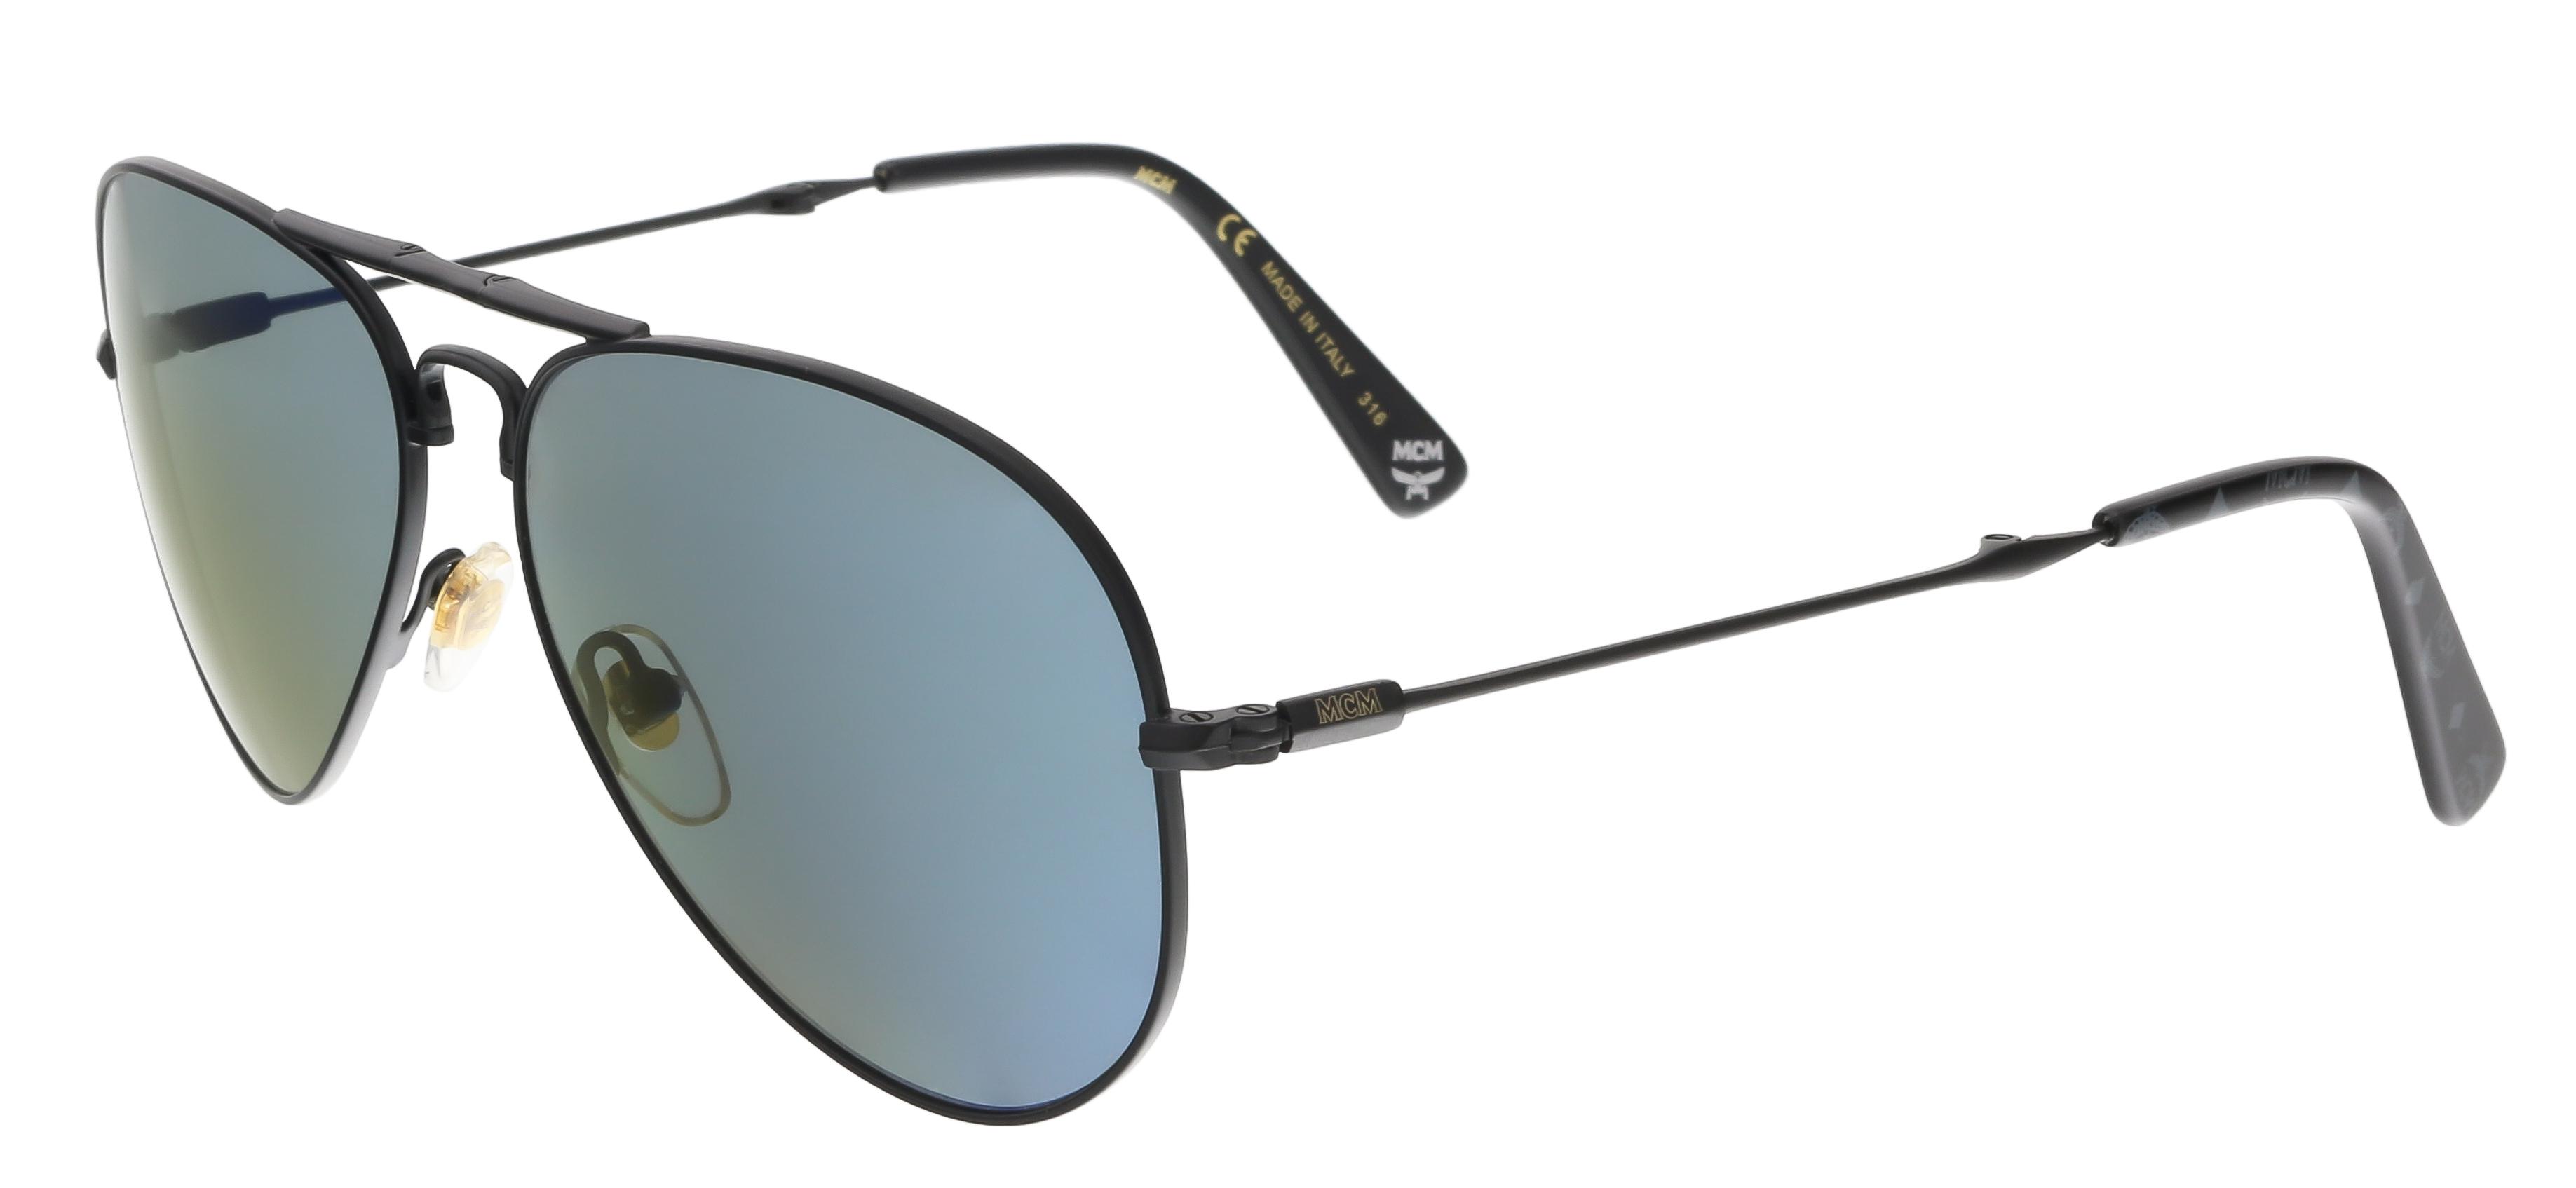 MCM101S 002 Matt Black Aviator Feline Sunglasses